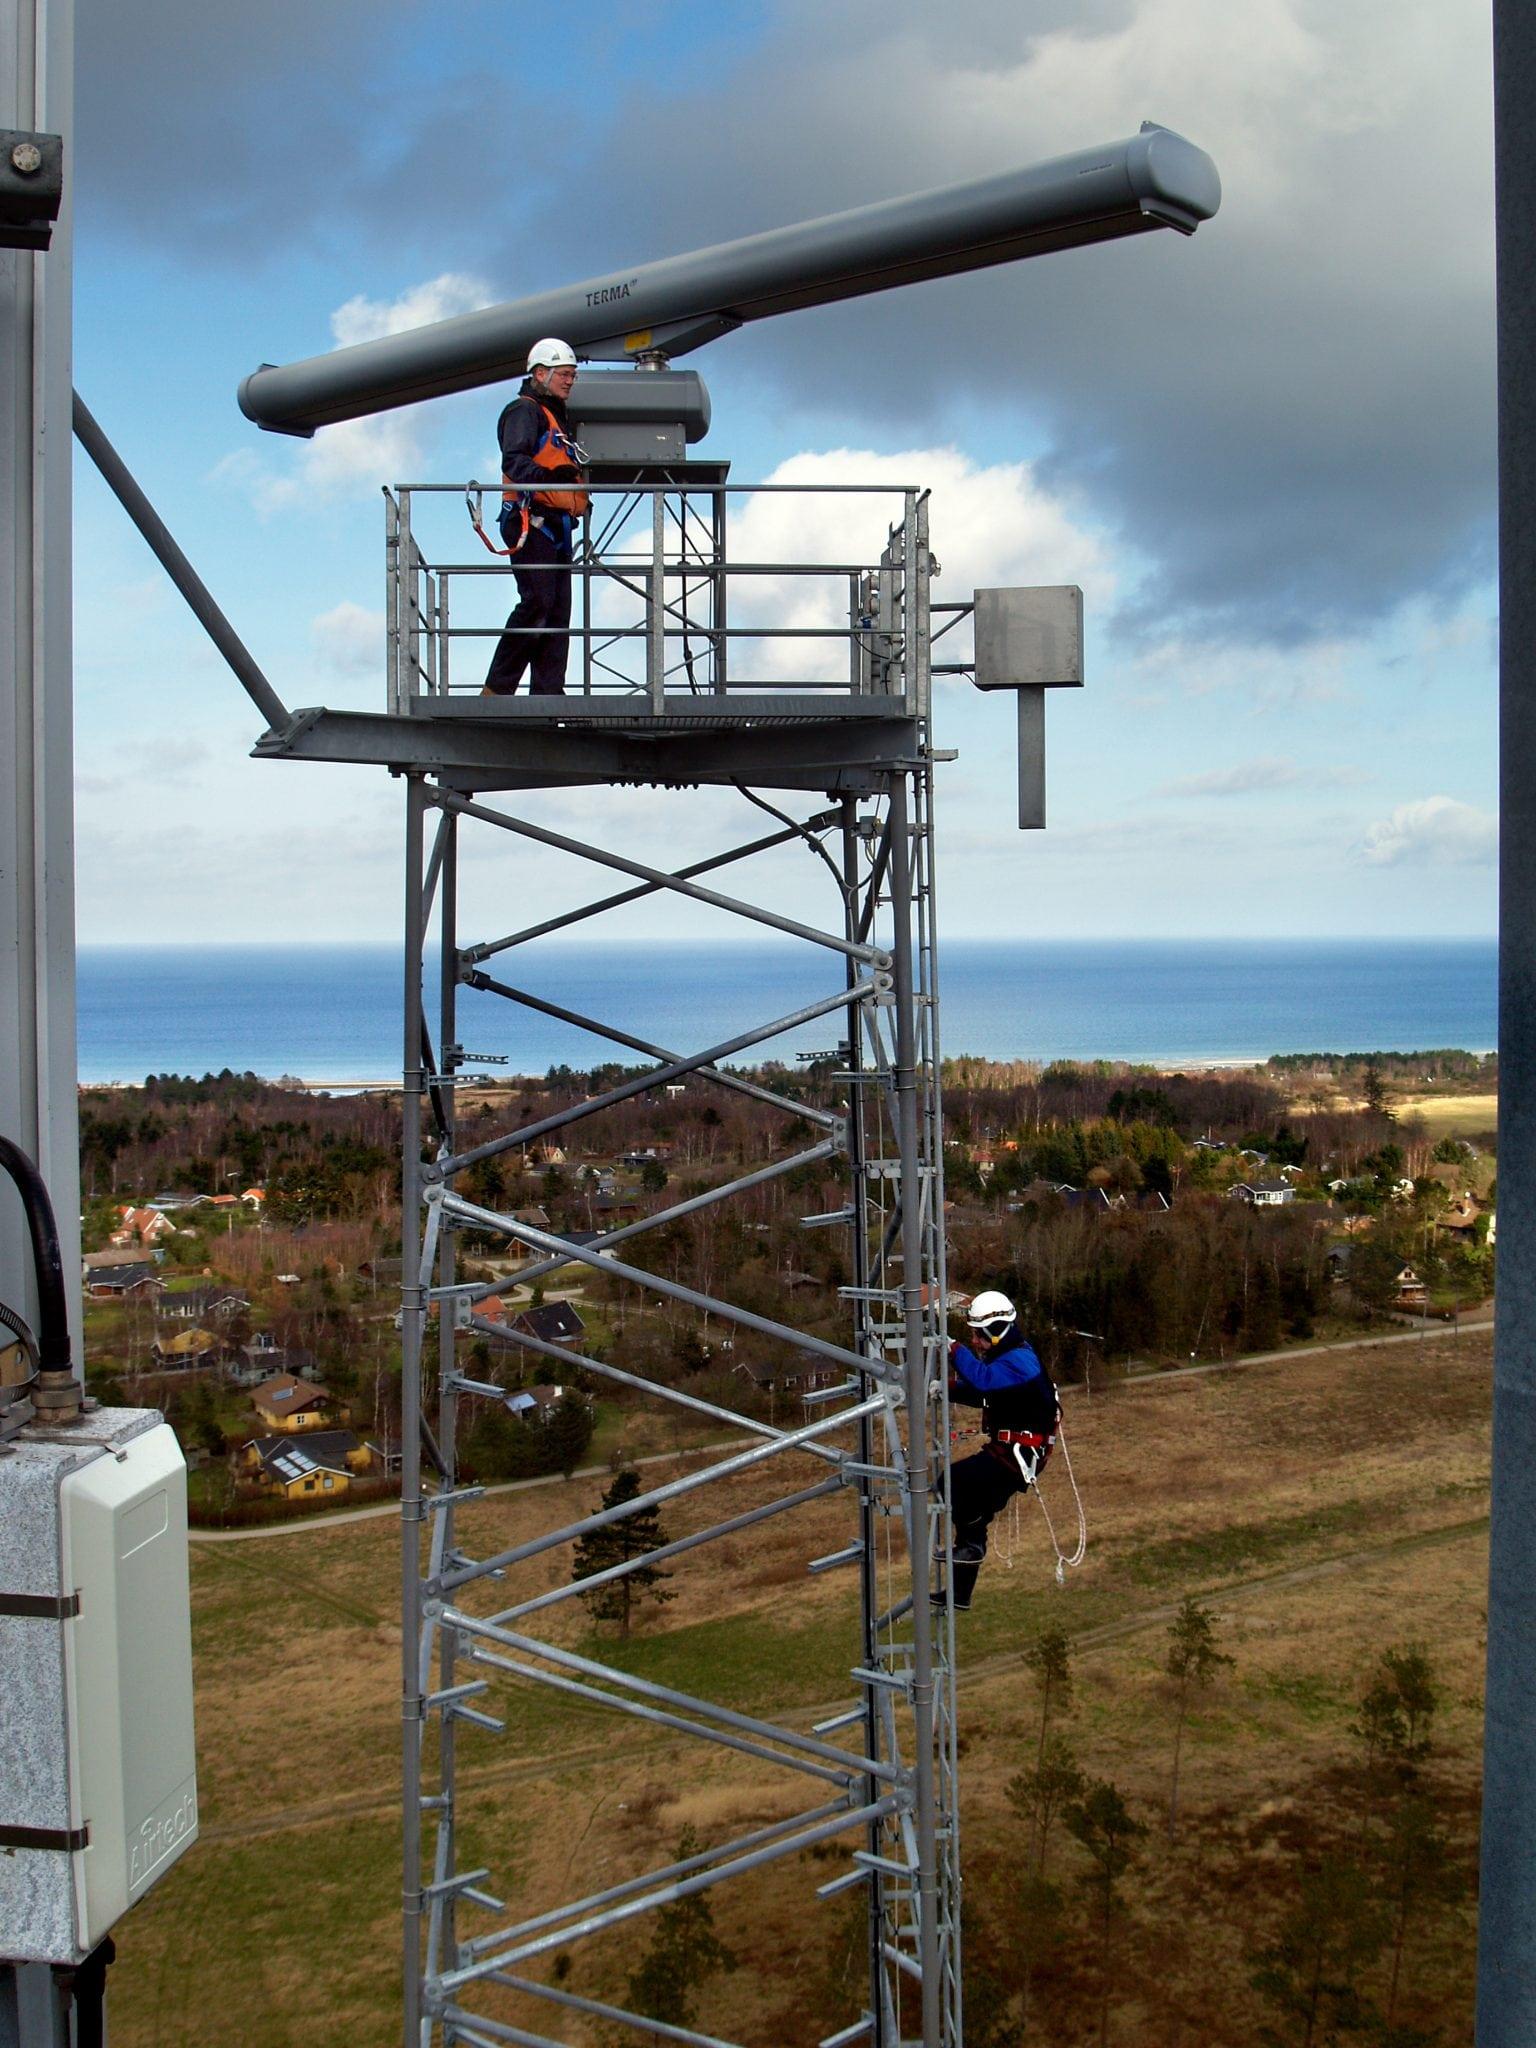 A SCANTER radar site in Denmark